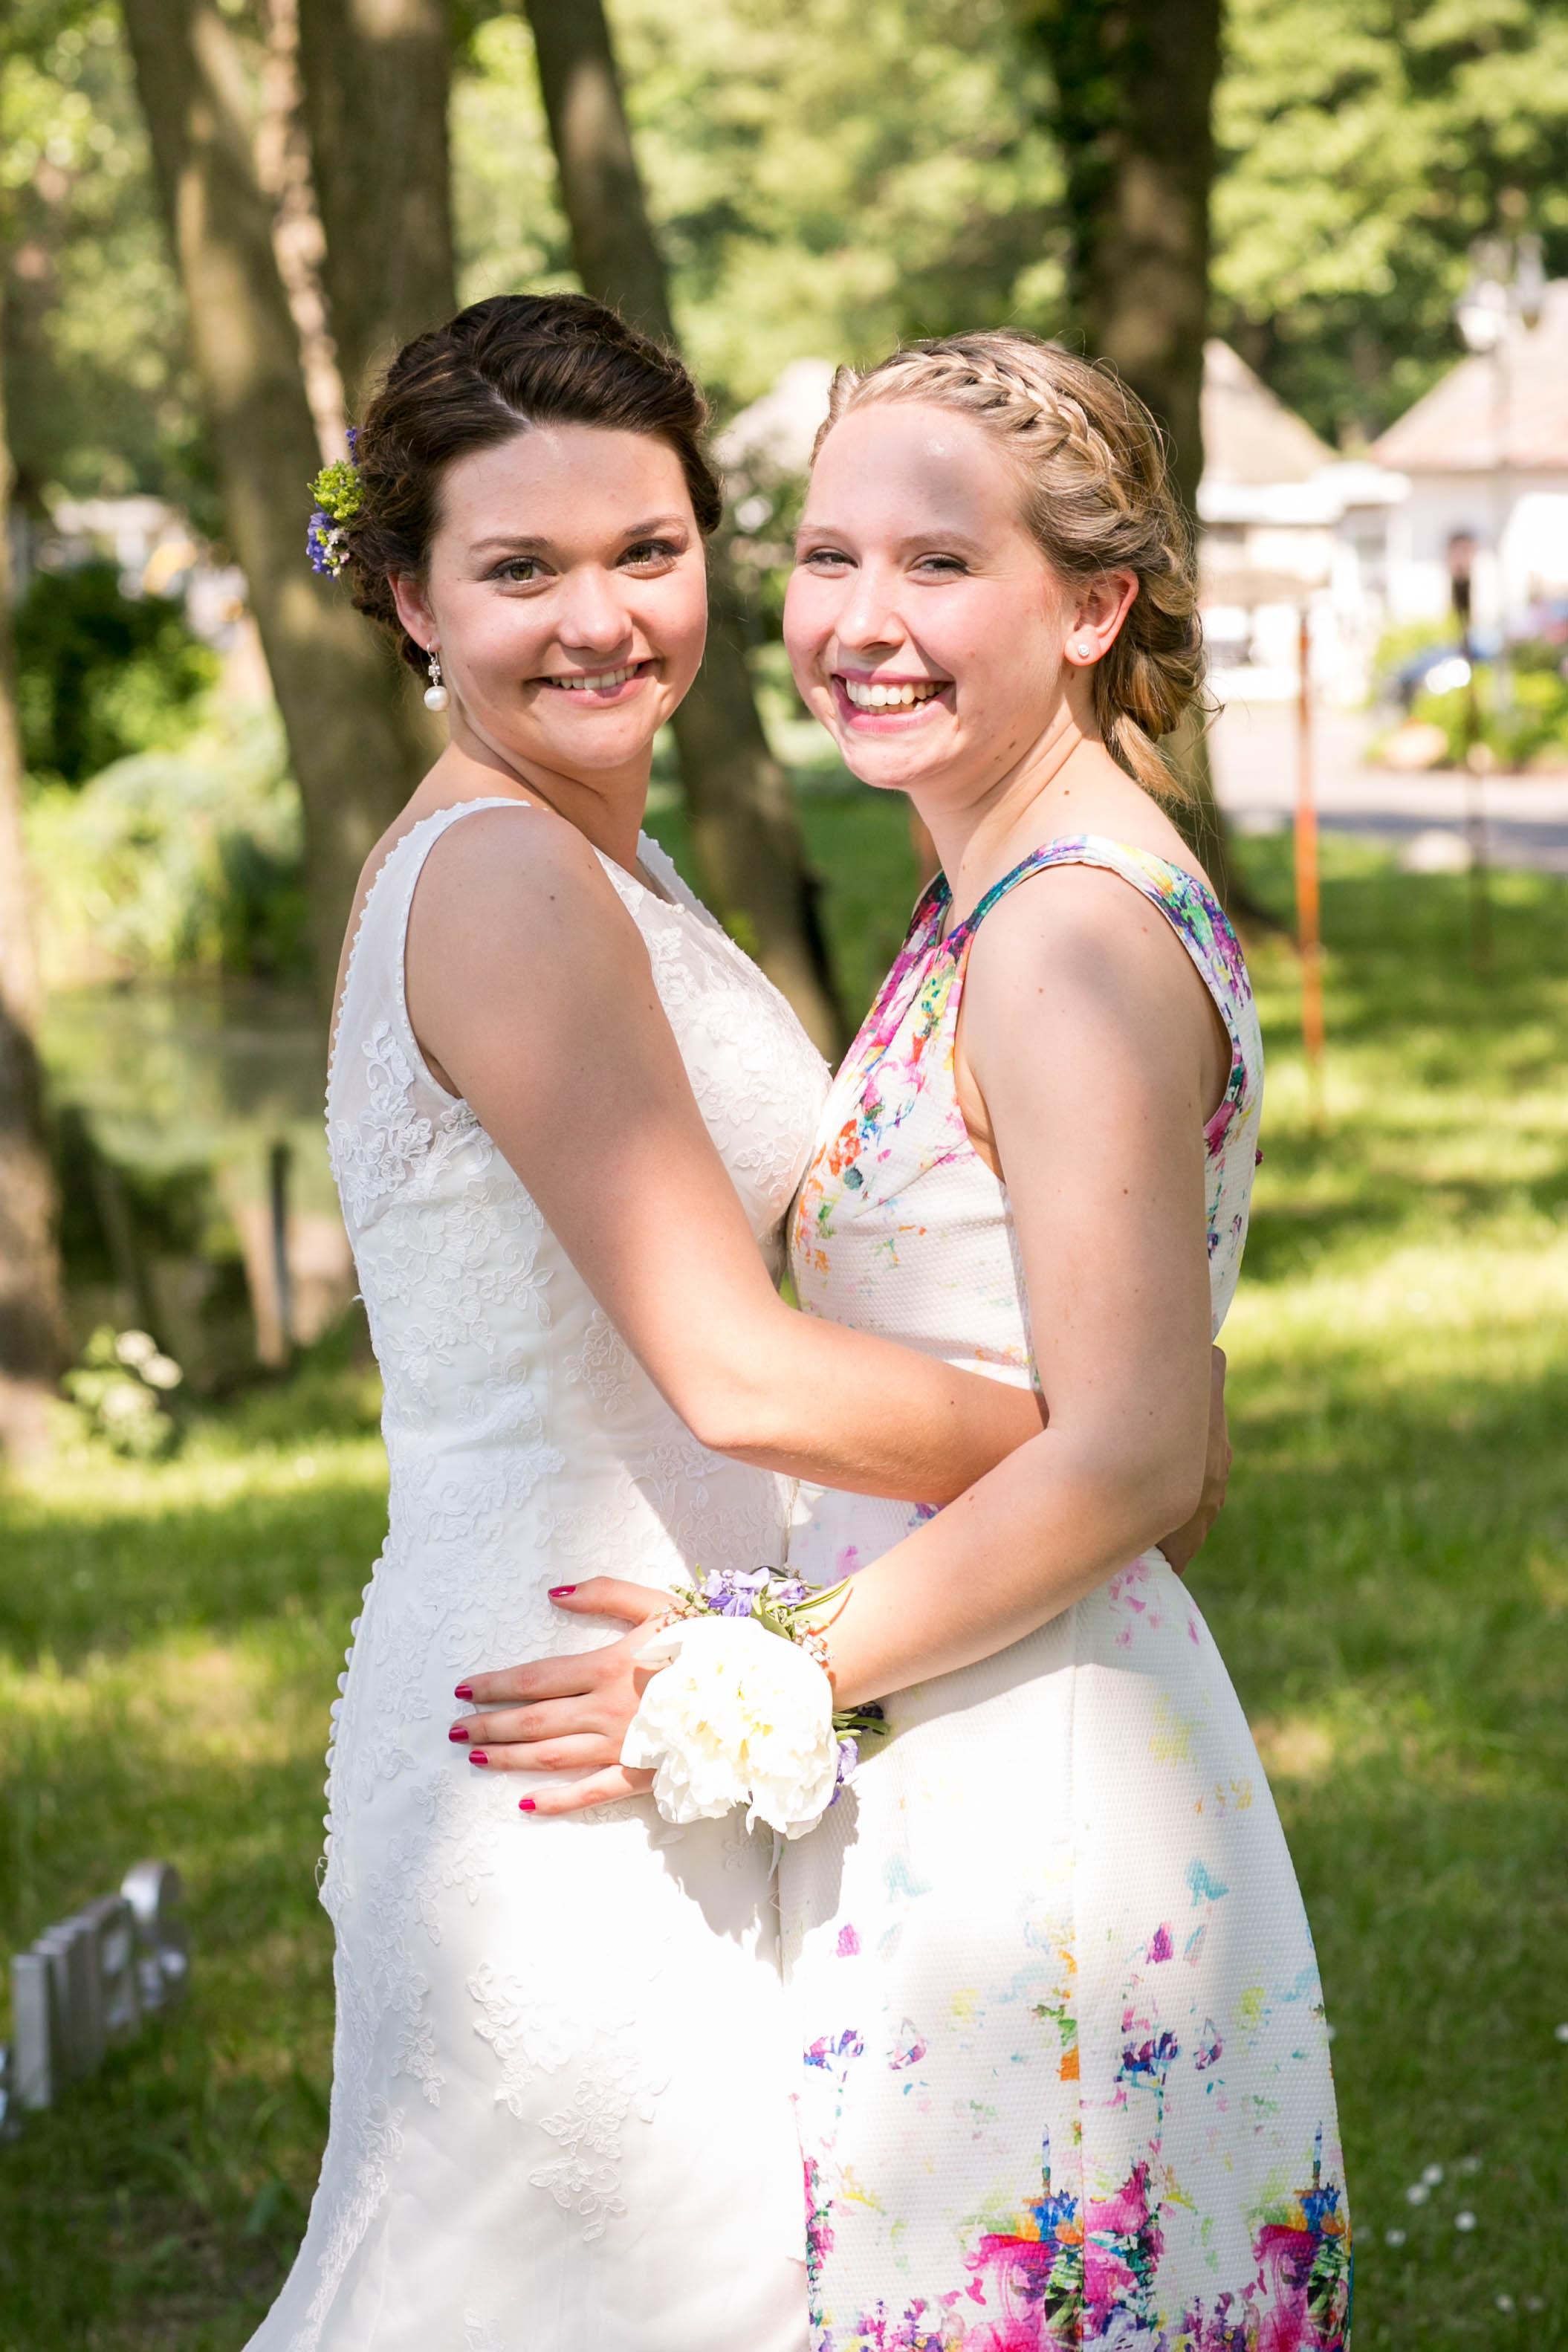 Hochzeitsfotografie Berlin_Fran Burrows Fotografie-333.jpg